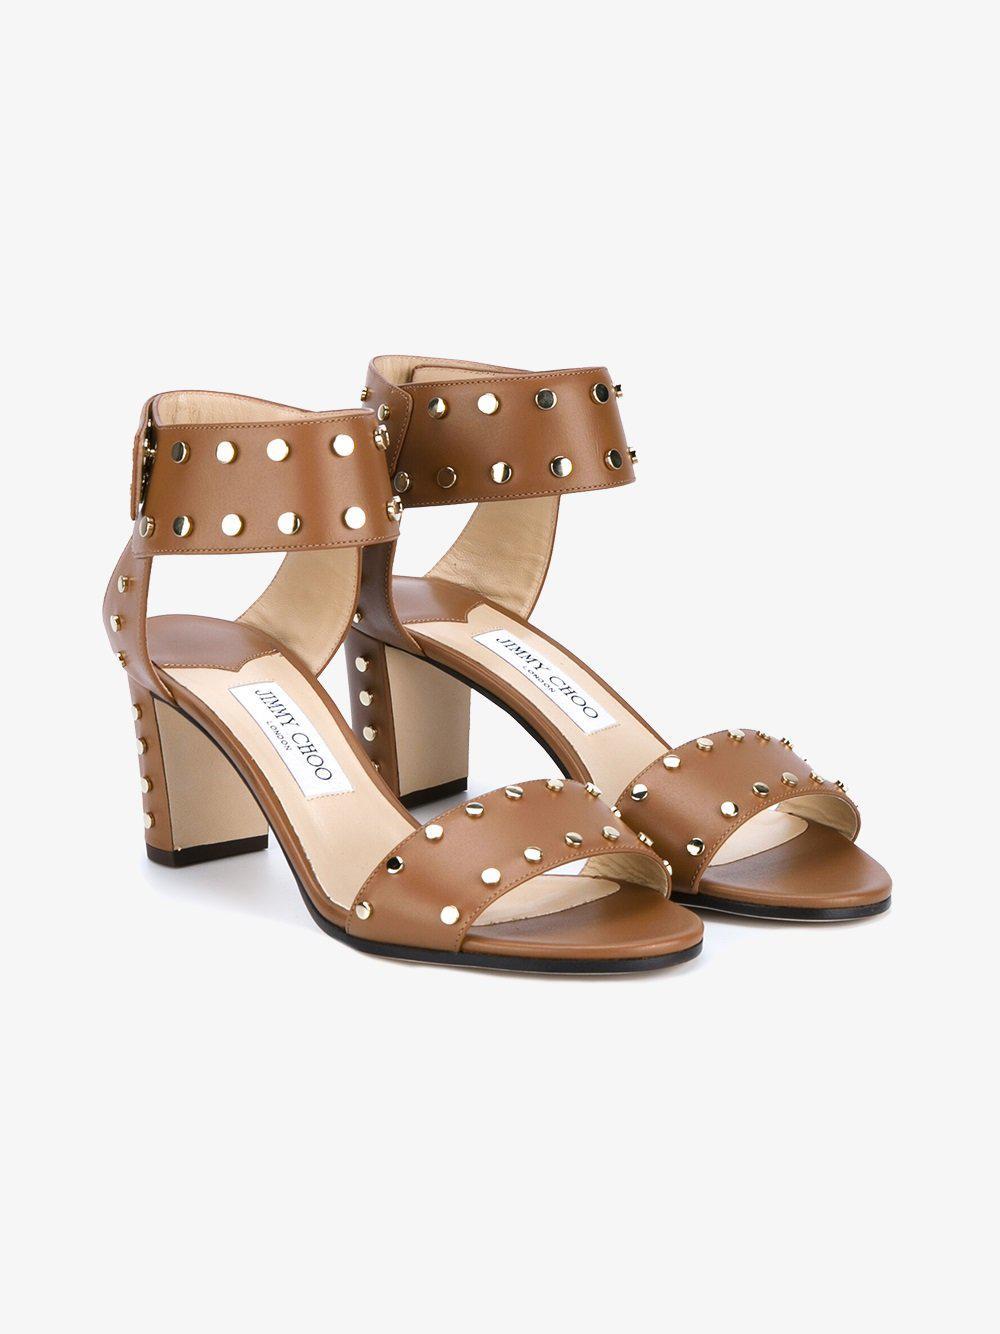 2014 unisex cheap online cheap price wholesale Jimmy Choo Veto Leather Studded Sandals rM5QEIGp